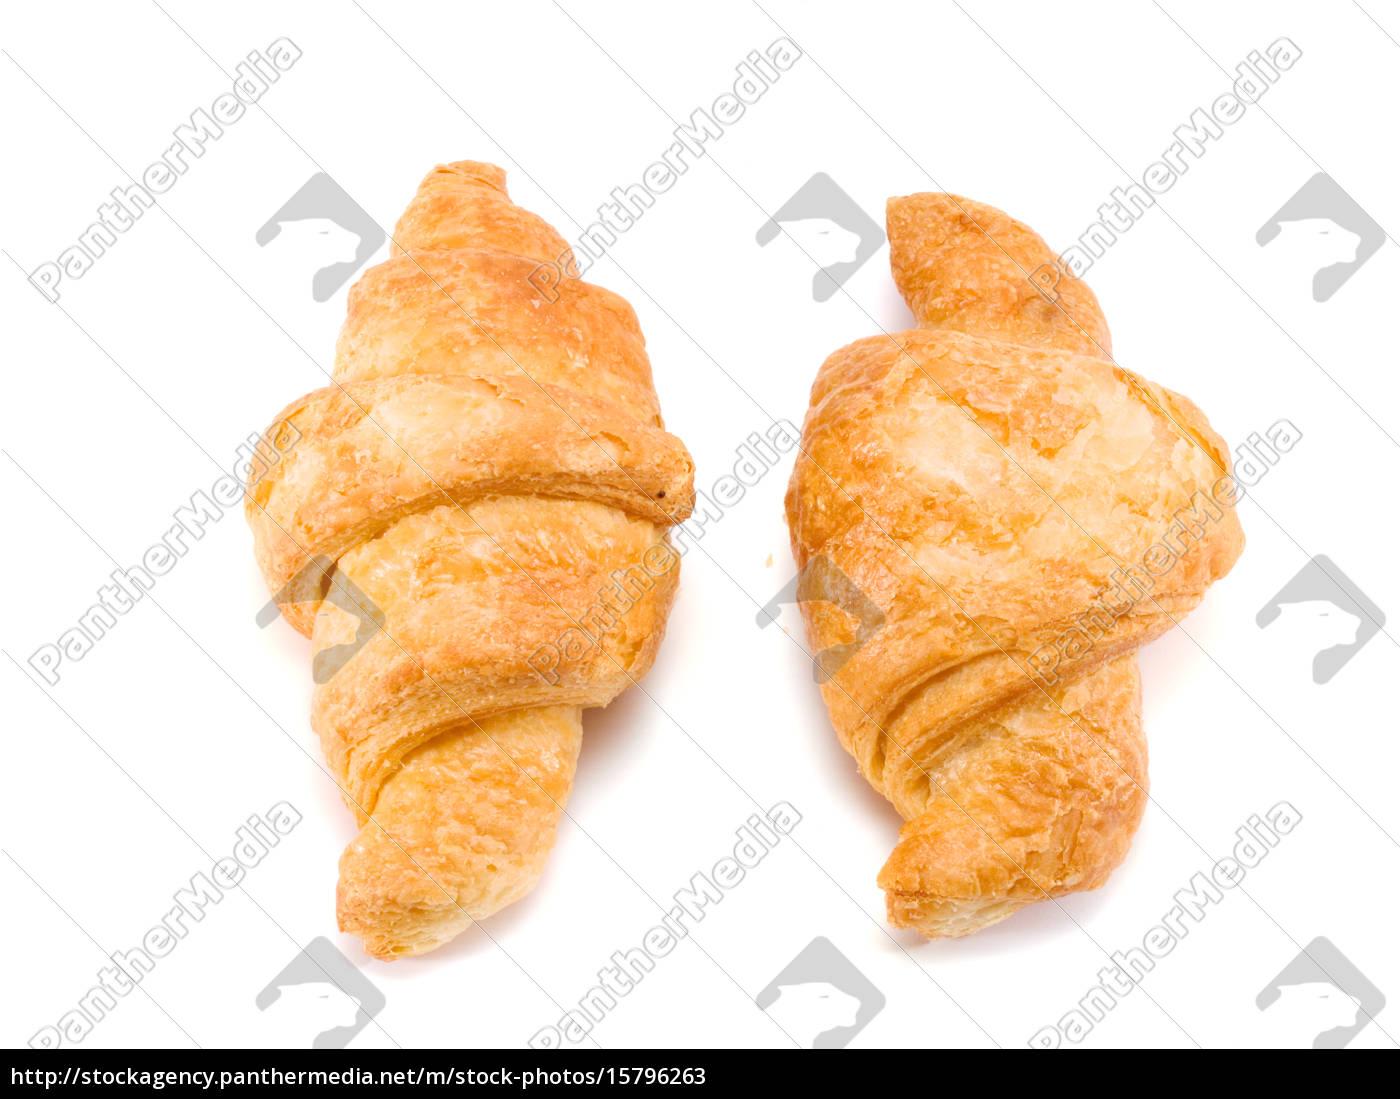 two, croissants, two, croissants, two, croissants, two, croissants, two, croissants, two - 15796263